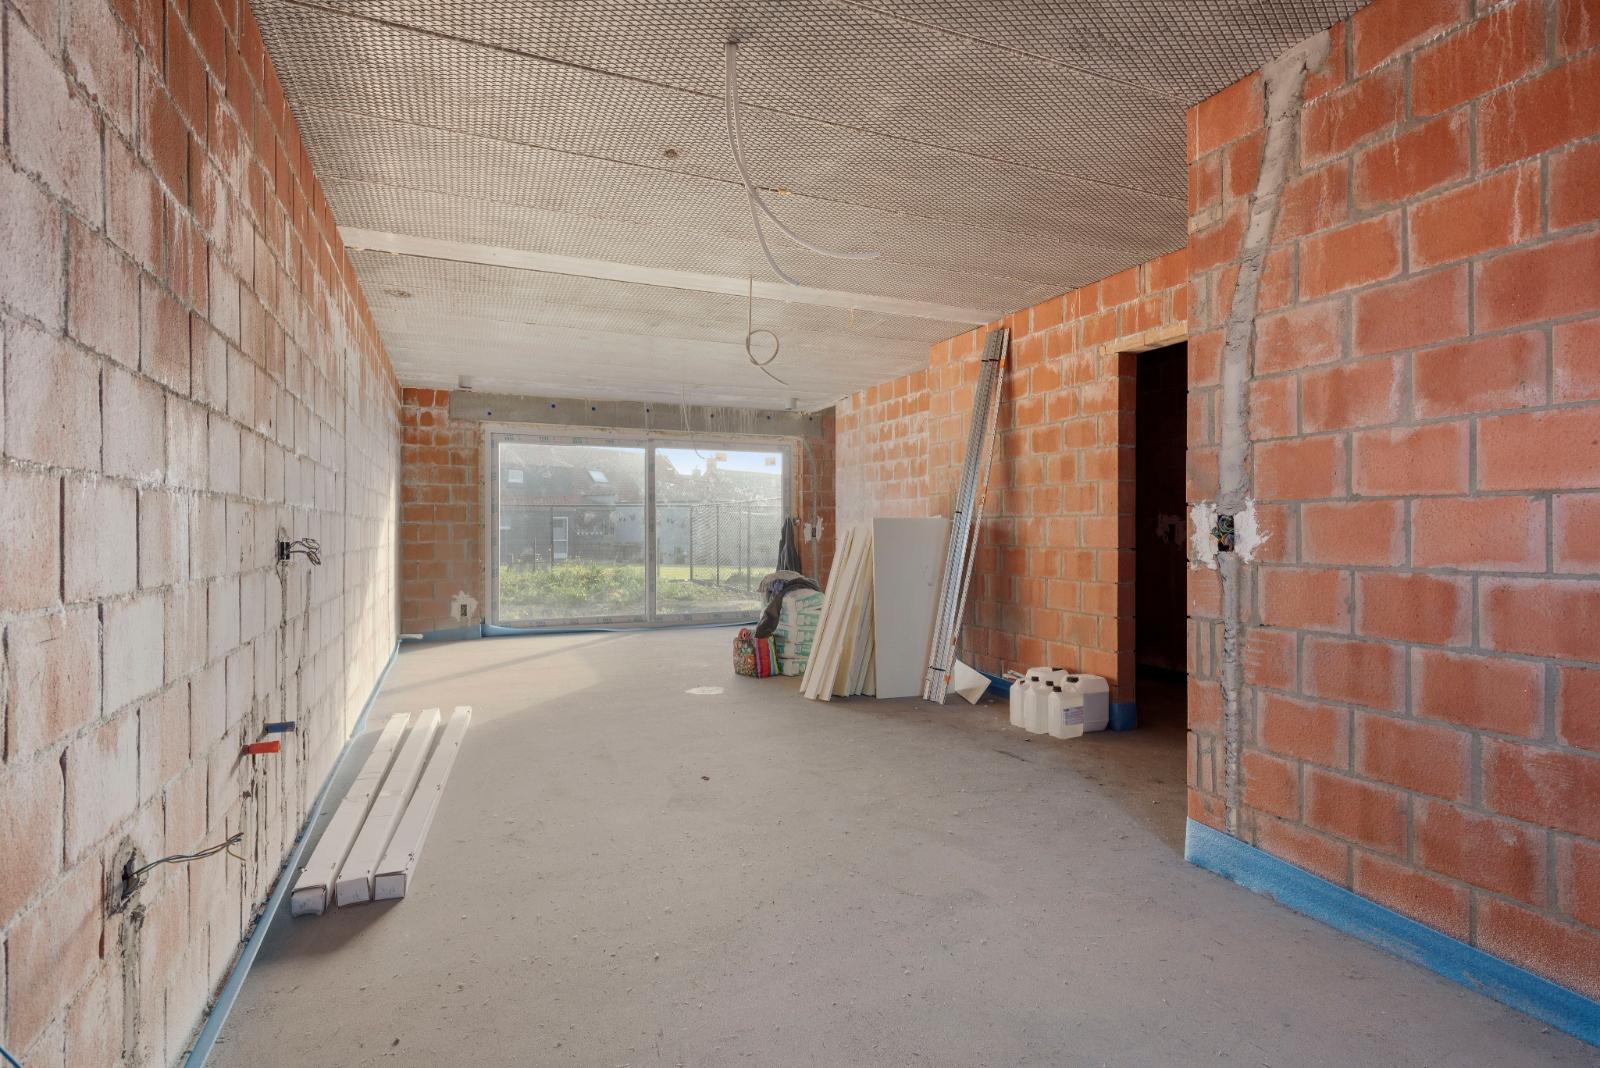 Kwaliteitsvolle nieuwbouwwoning in centrum Leke - 3